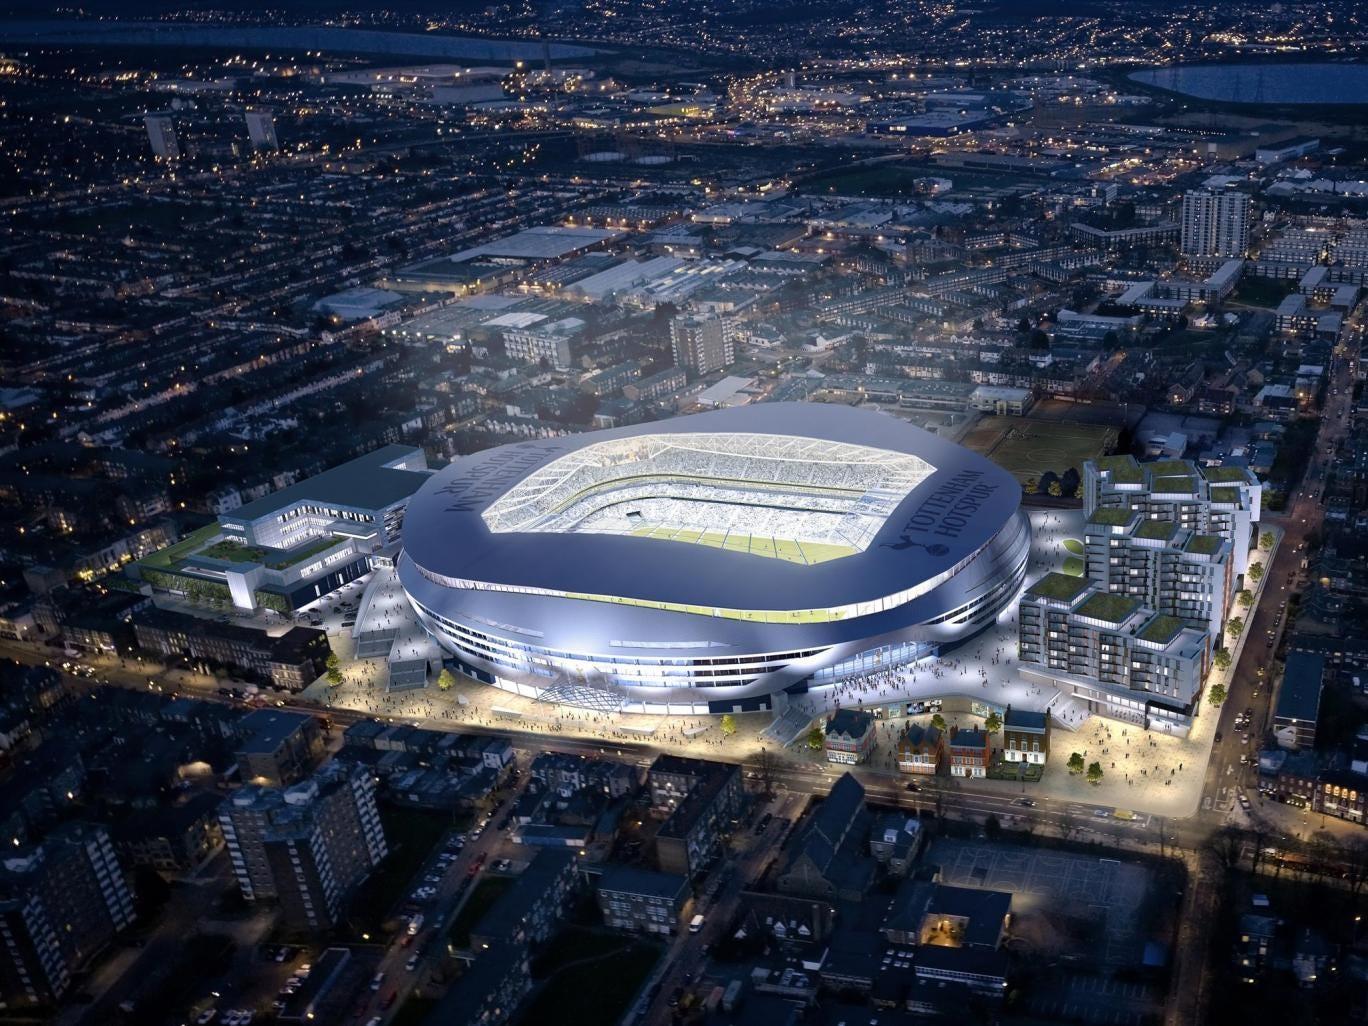 An artist's impression of Tottenham's new ground